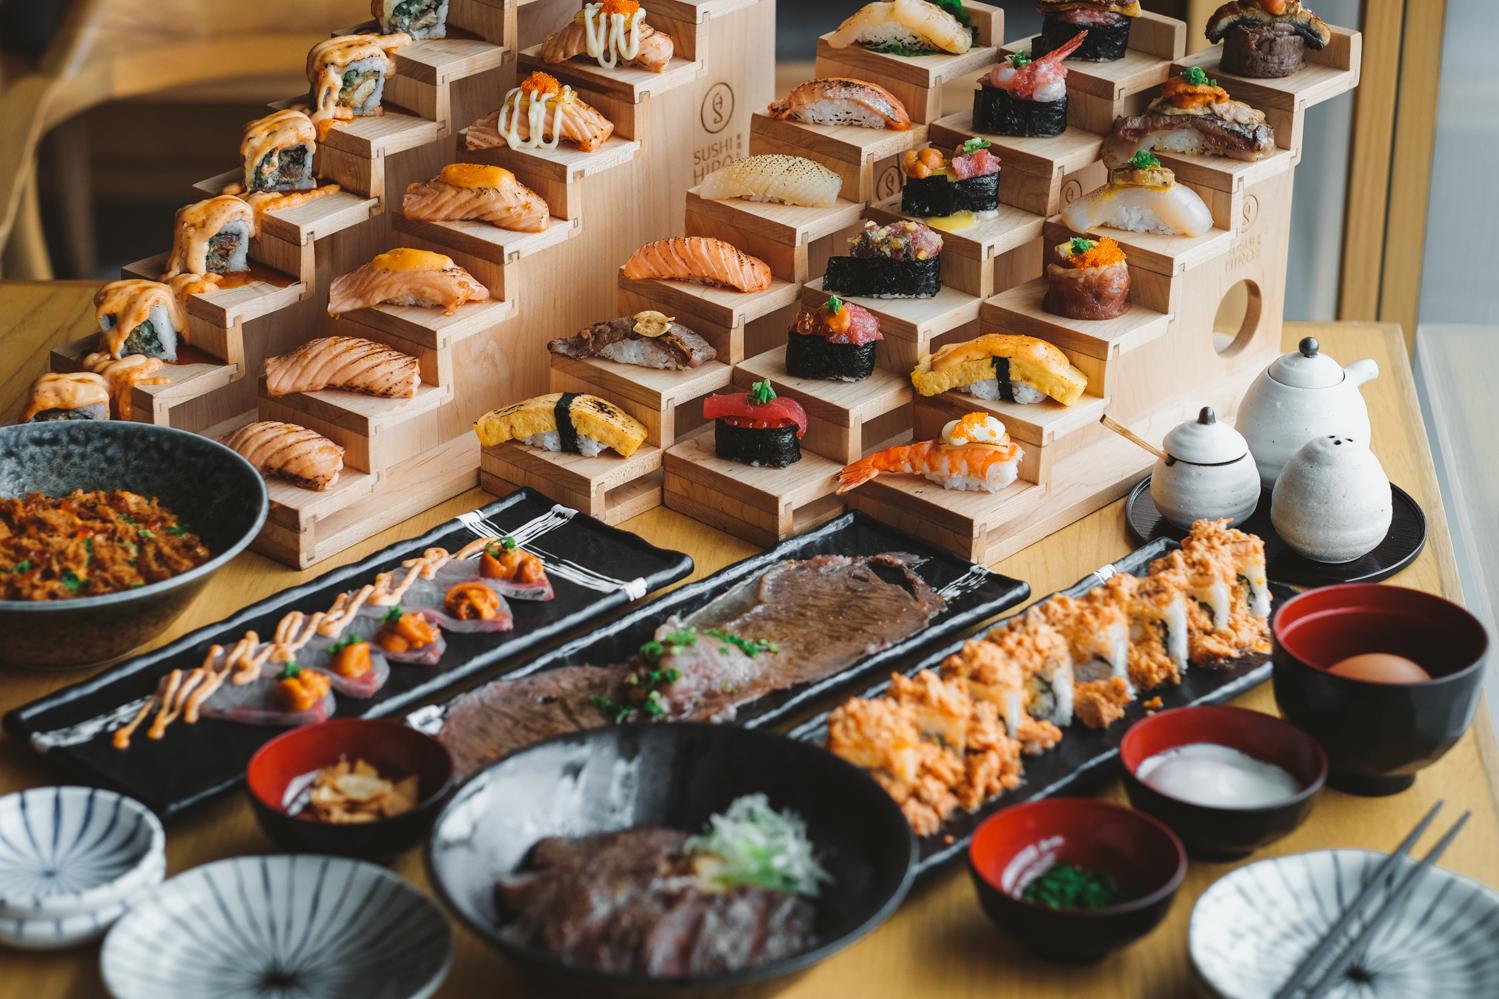 5 Restoran Sushi Paling Populer Di Jakarta